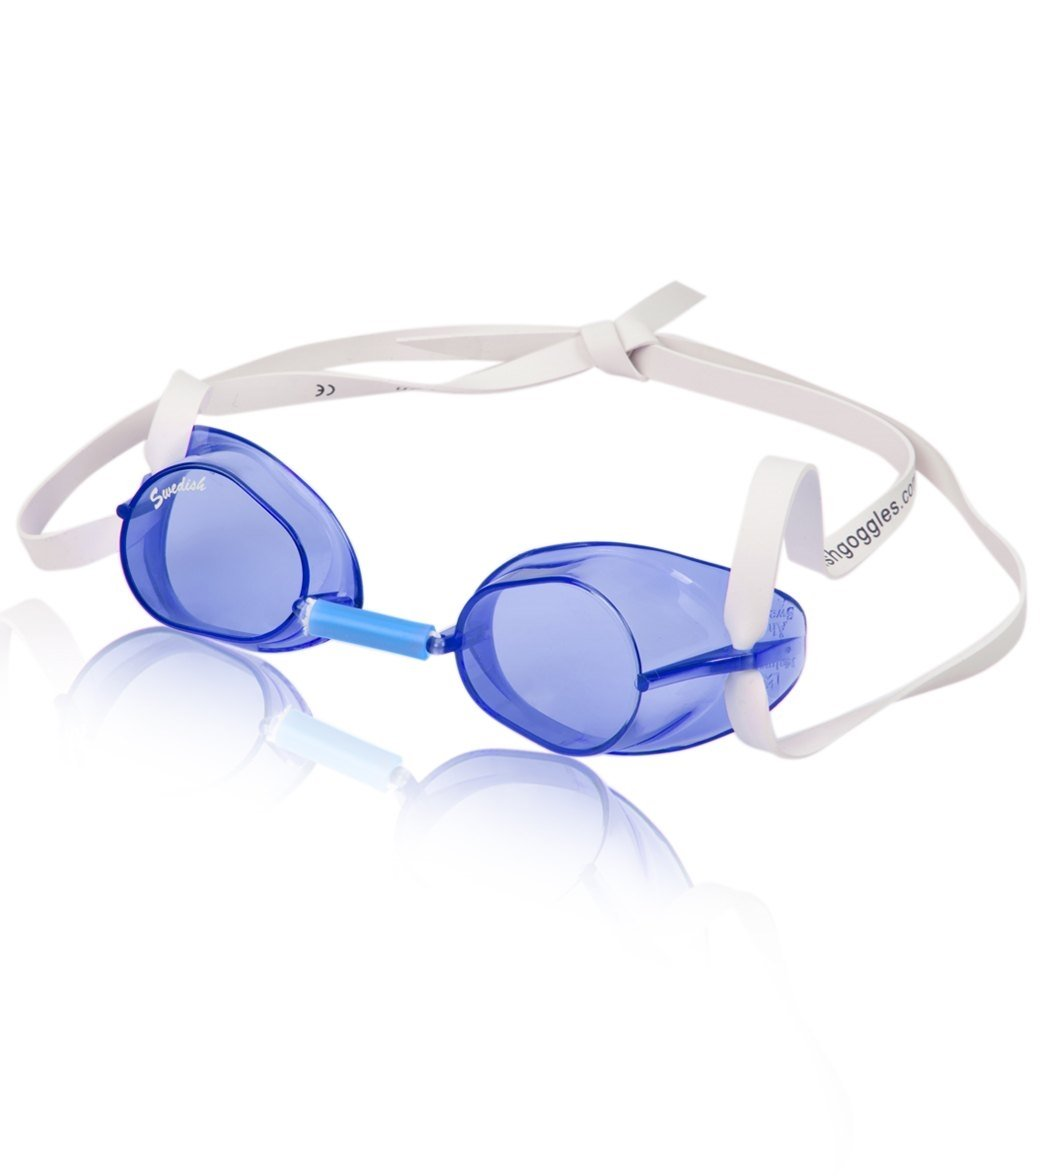 9b4793db8f0e Beco Swedish Goggles Anti-Fog Swimming Goggles